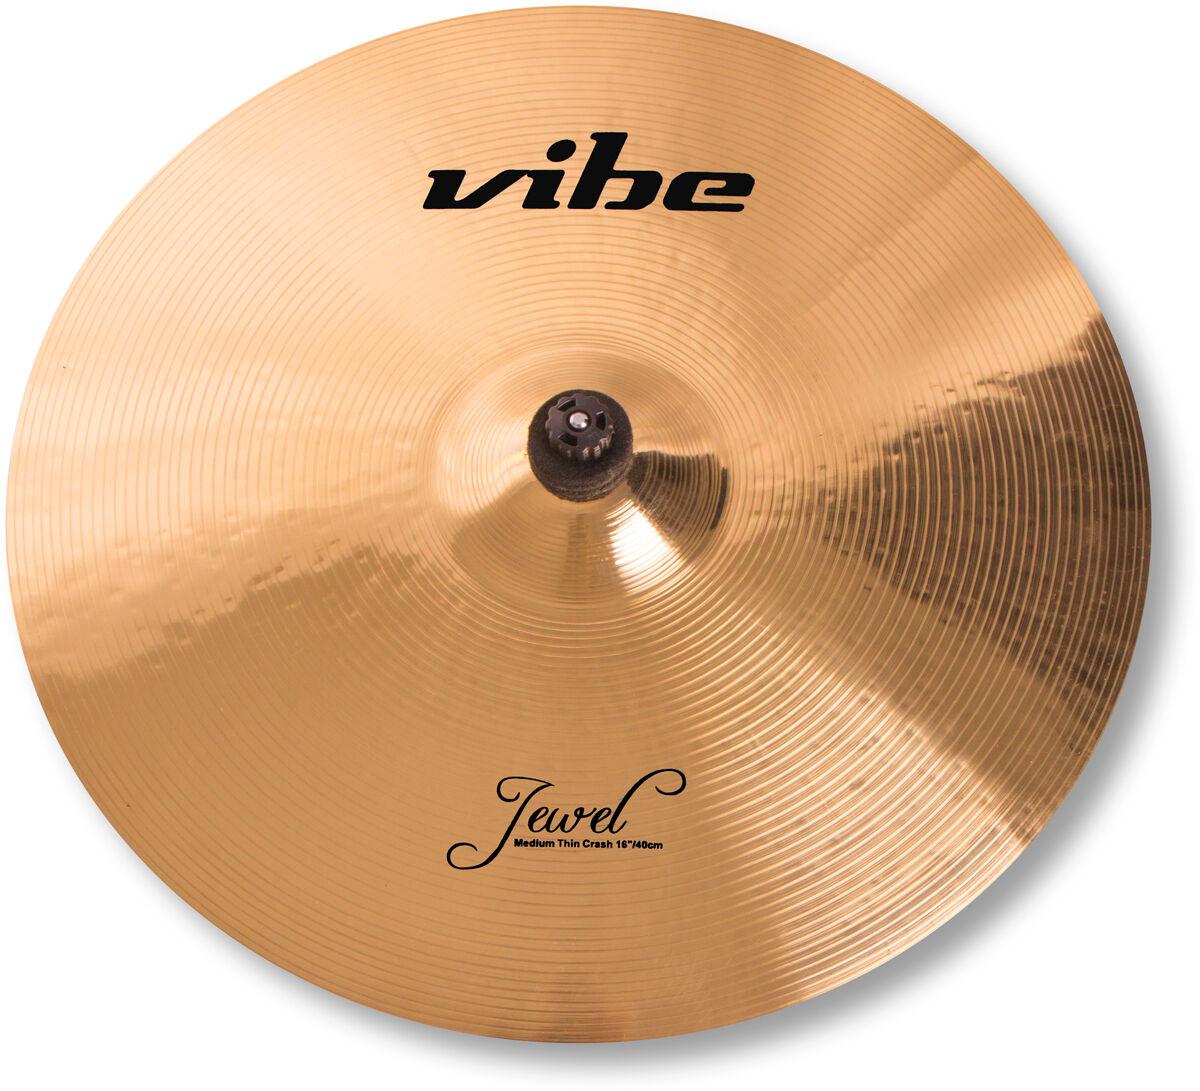 16  Vibe Jewel Brilliant Medium Thin Crash Becken Cymbal B20 mit Zertifikat